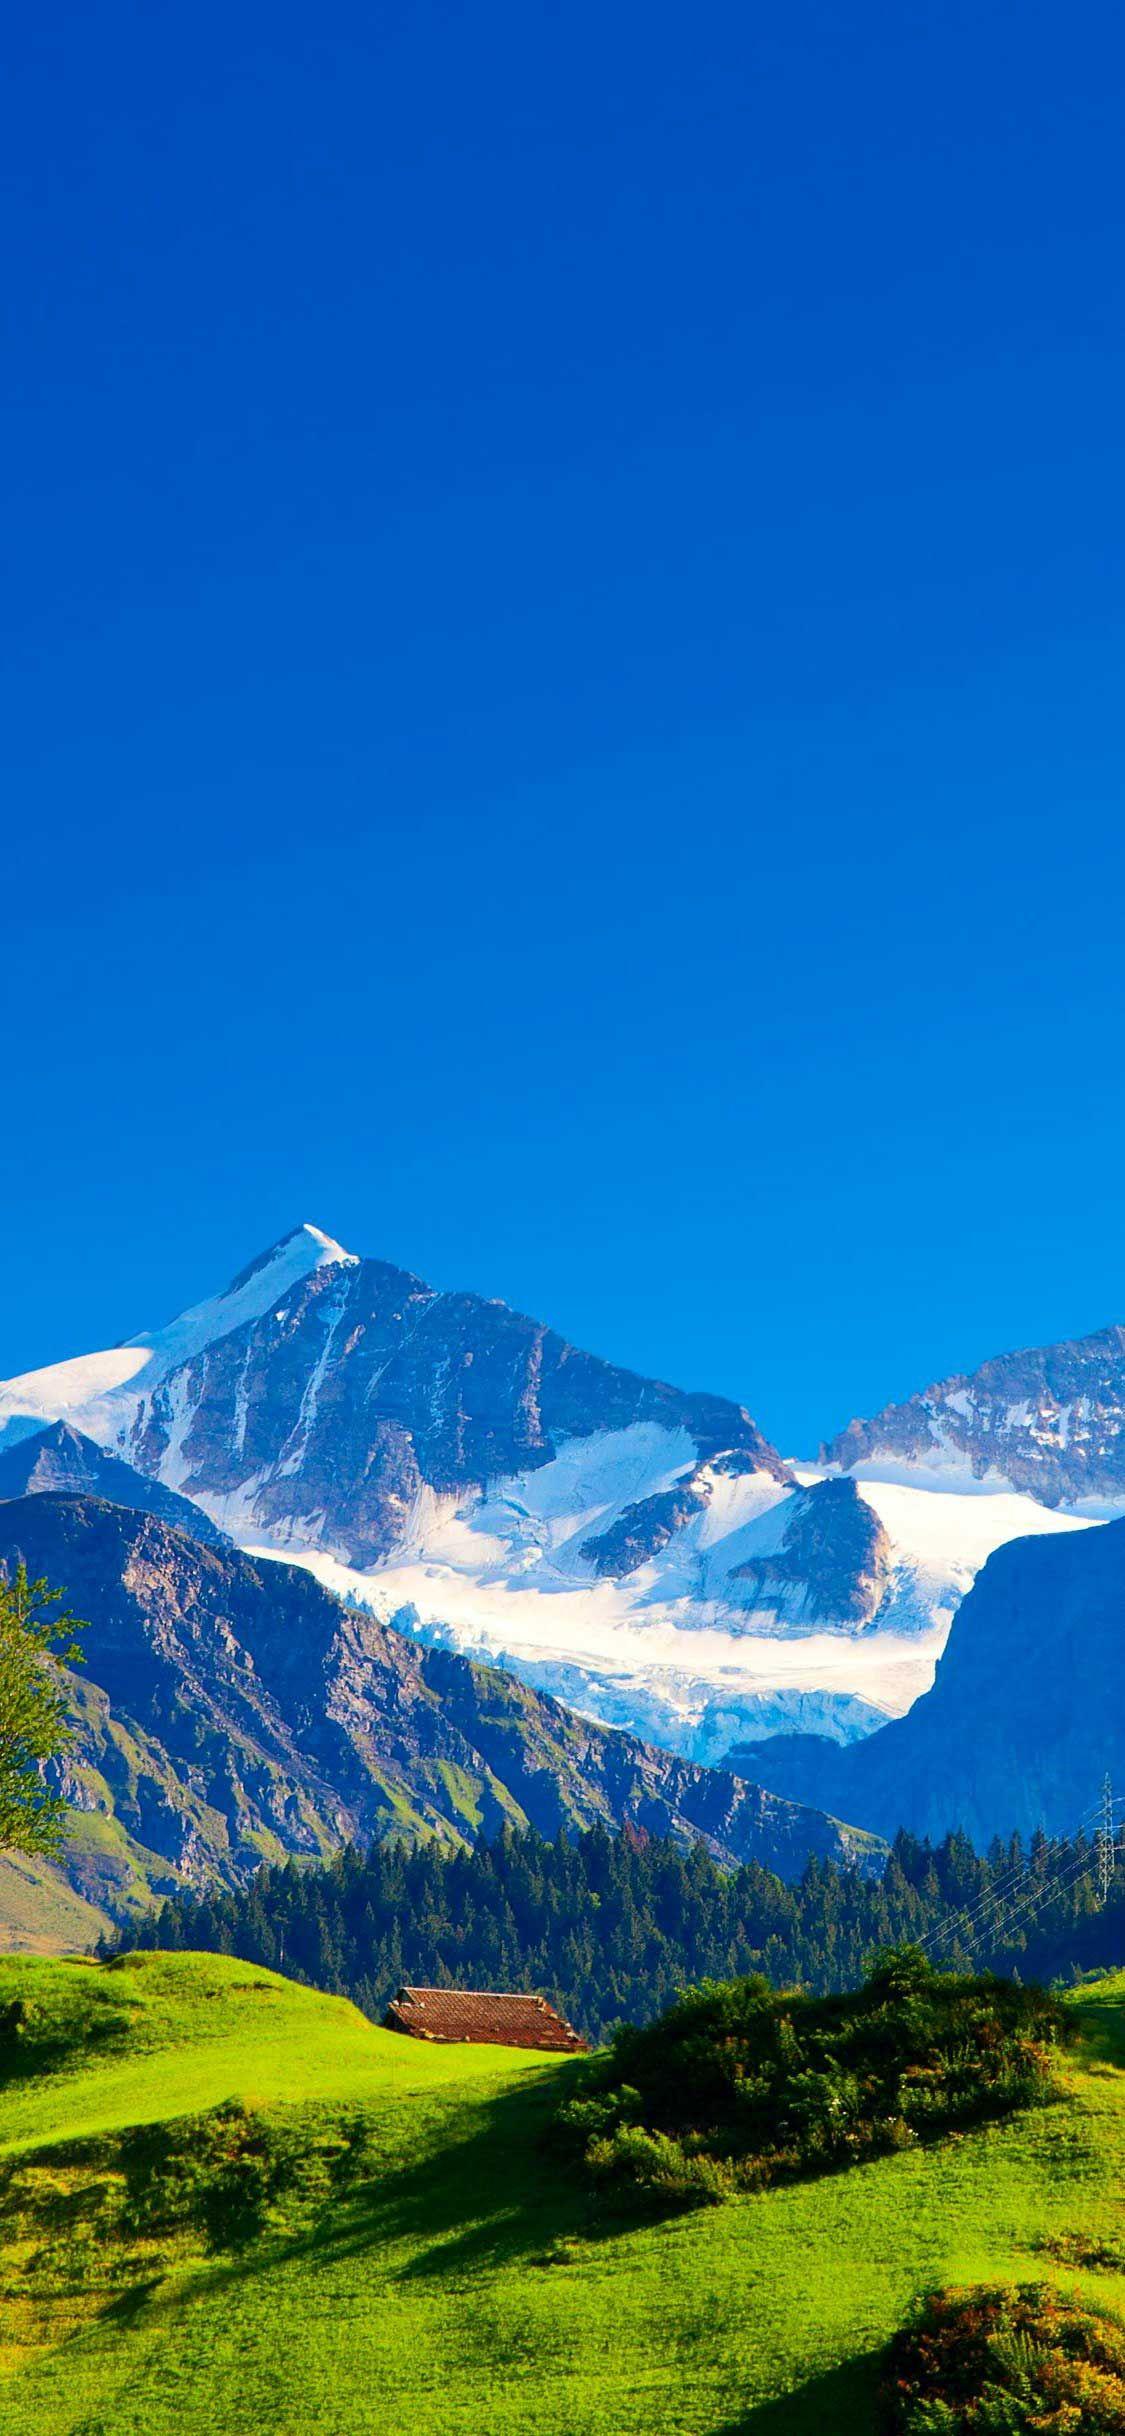 Iphone Pro Wallpaper Switzerland alps mountains landscape